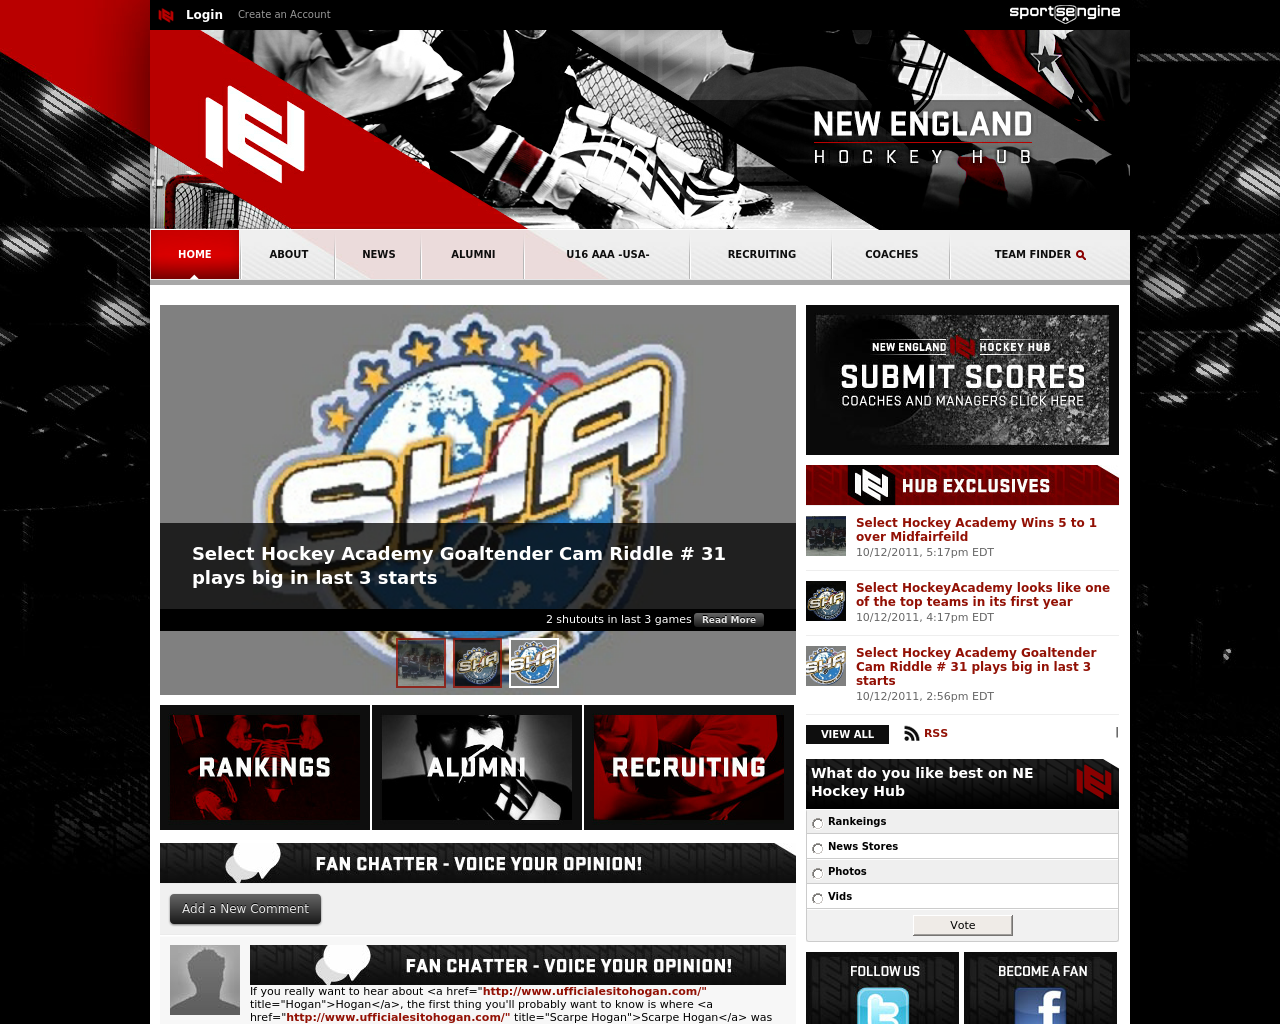 New-England-Hockey-Hub-Advertising-Reviews-Pricing